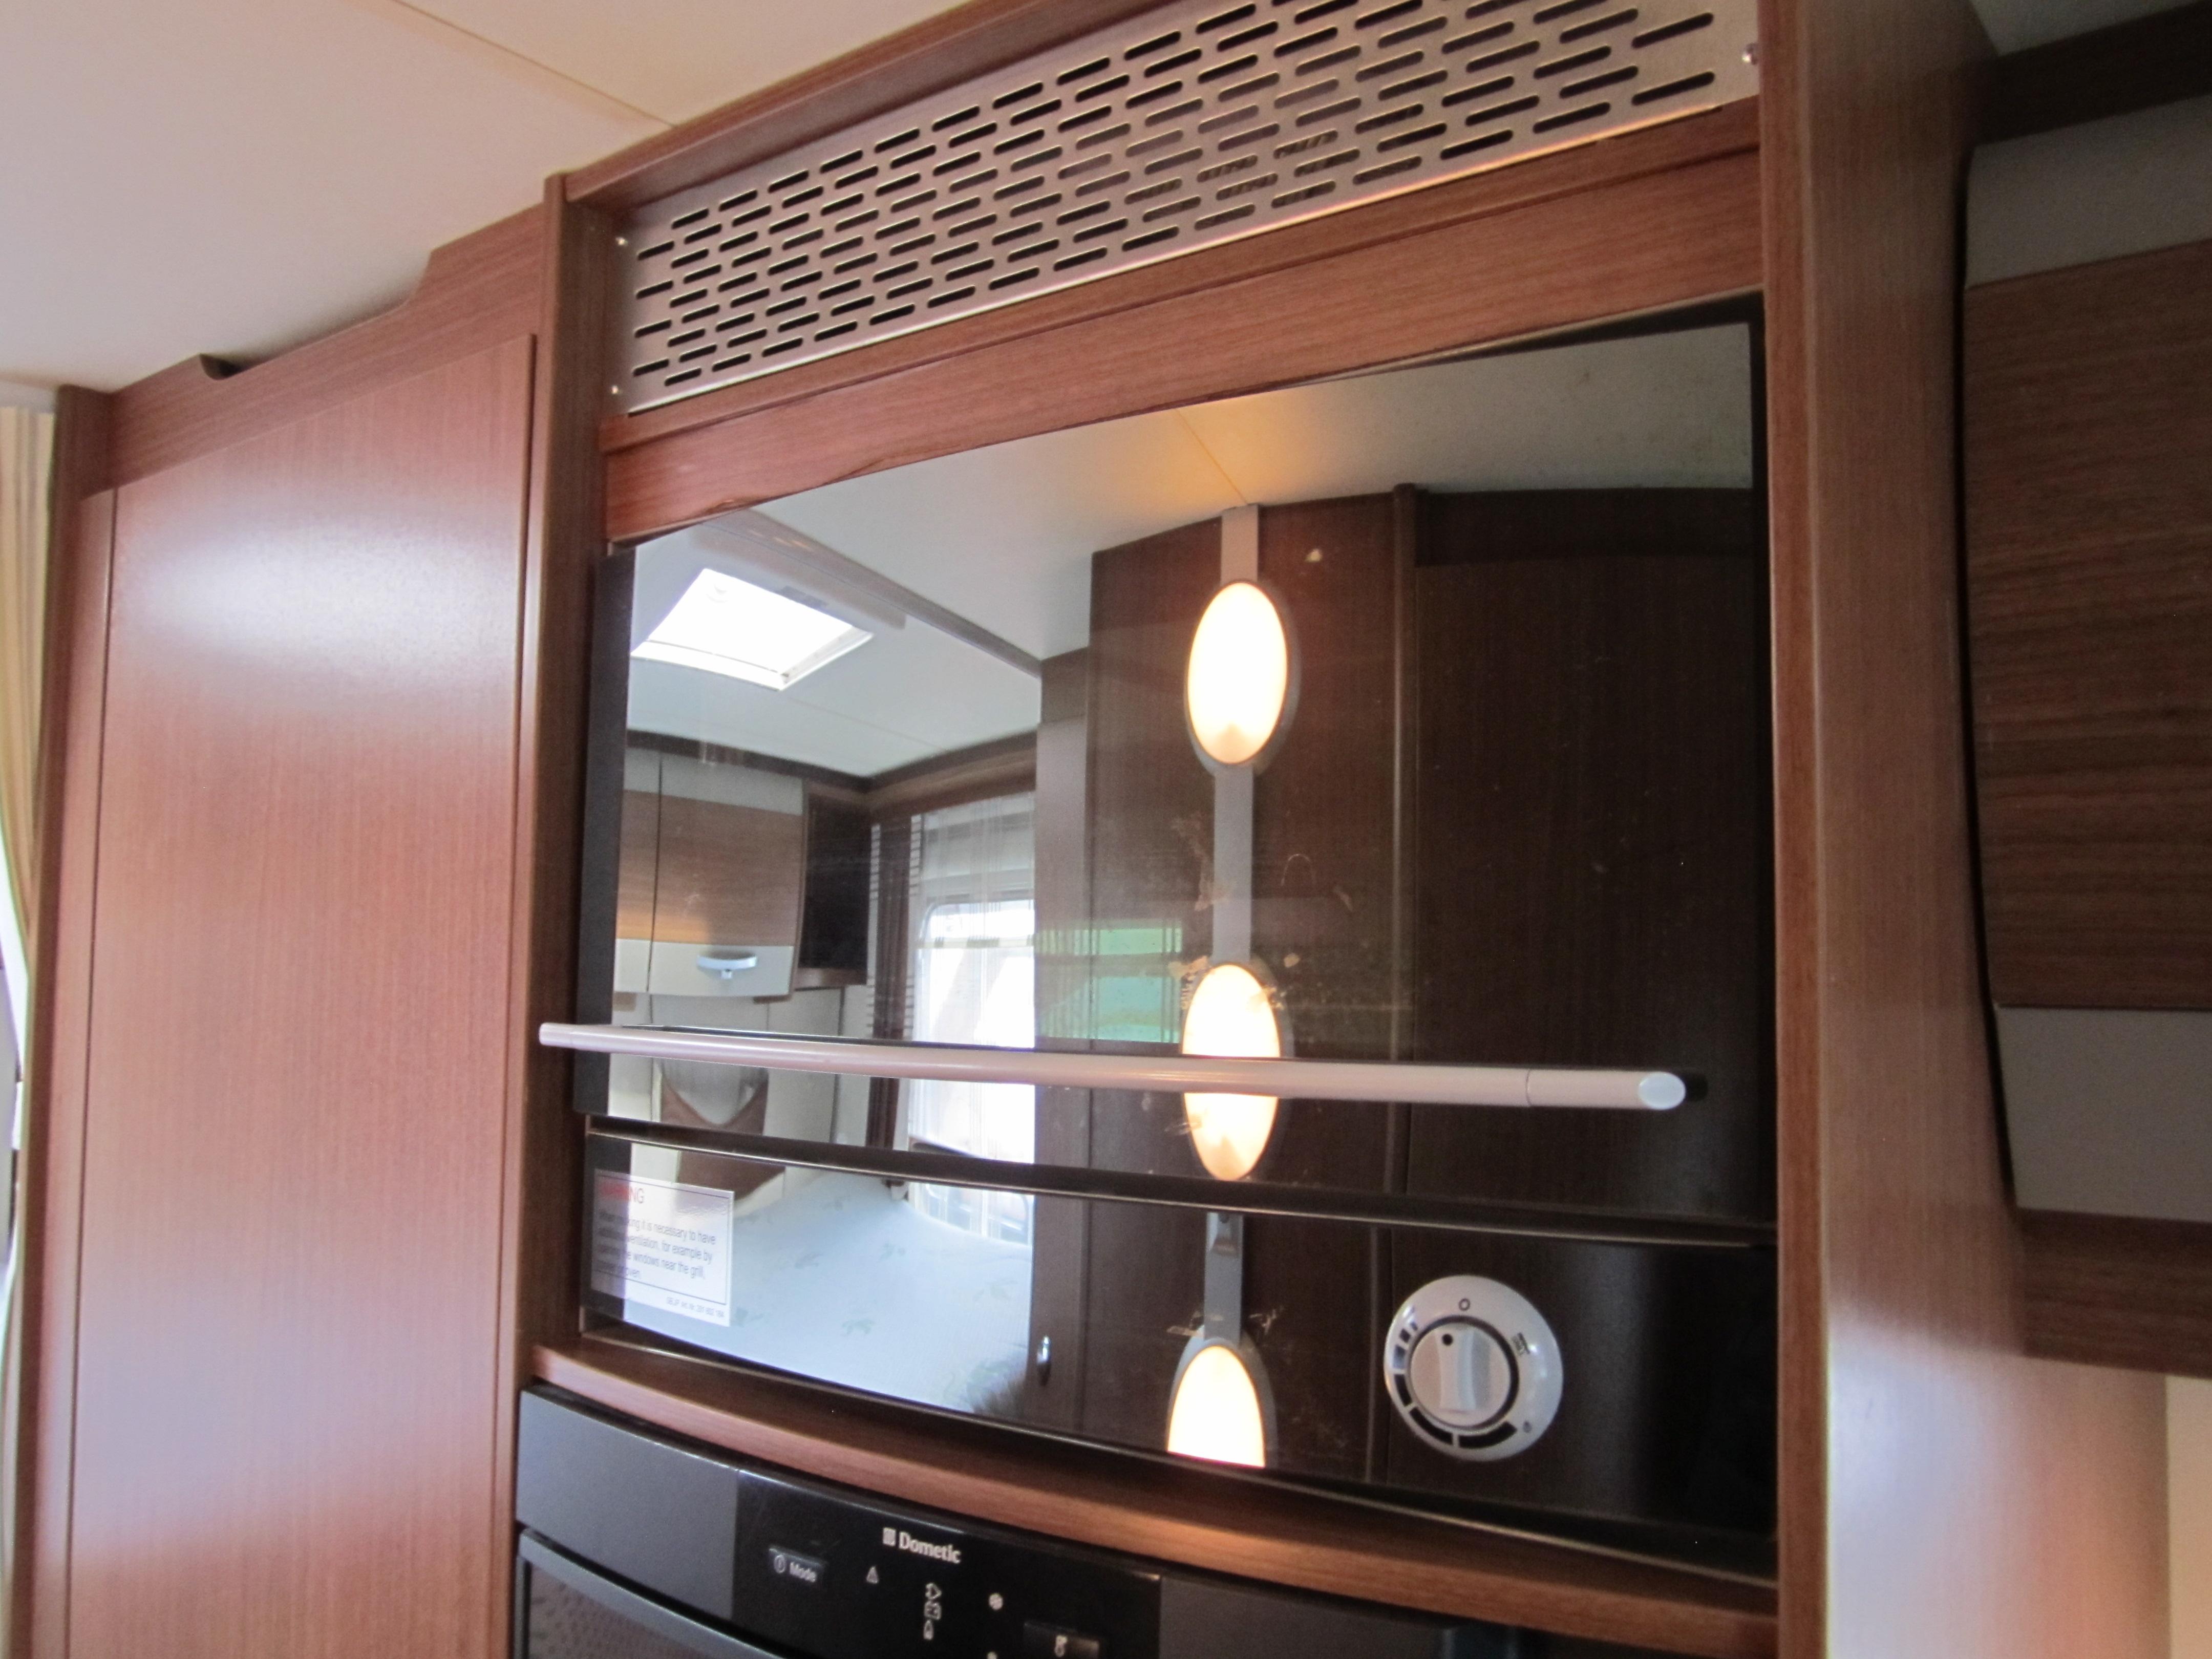 Captain Boat Seats >> 2012 Burstner Nexxo T715G Motorhome. Transverse Double Bed. Large Garage. Leather Seats. High ...